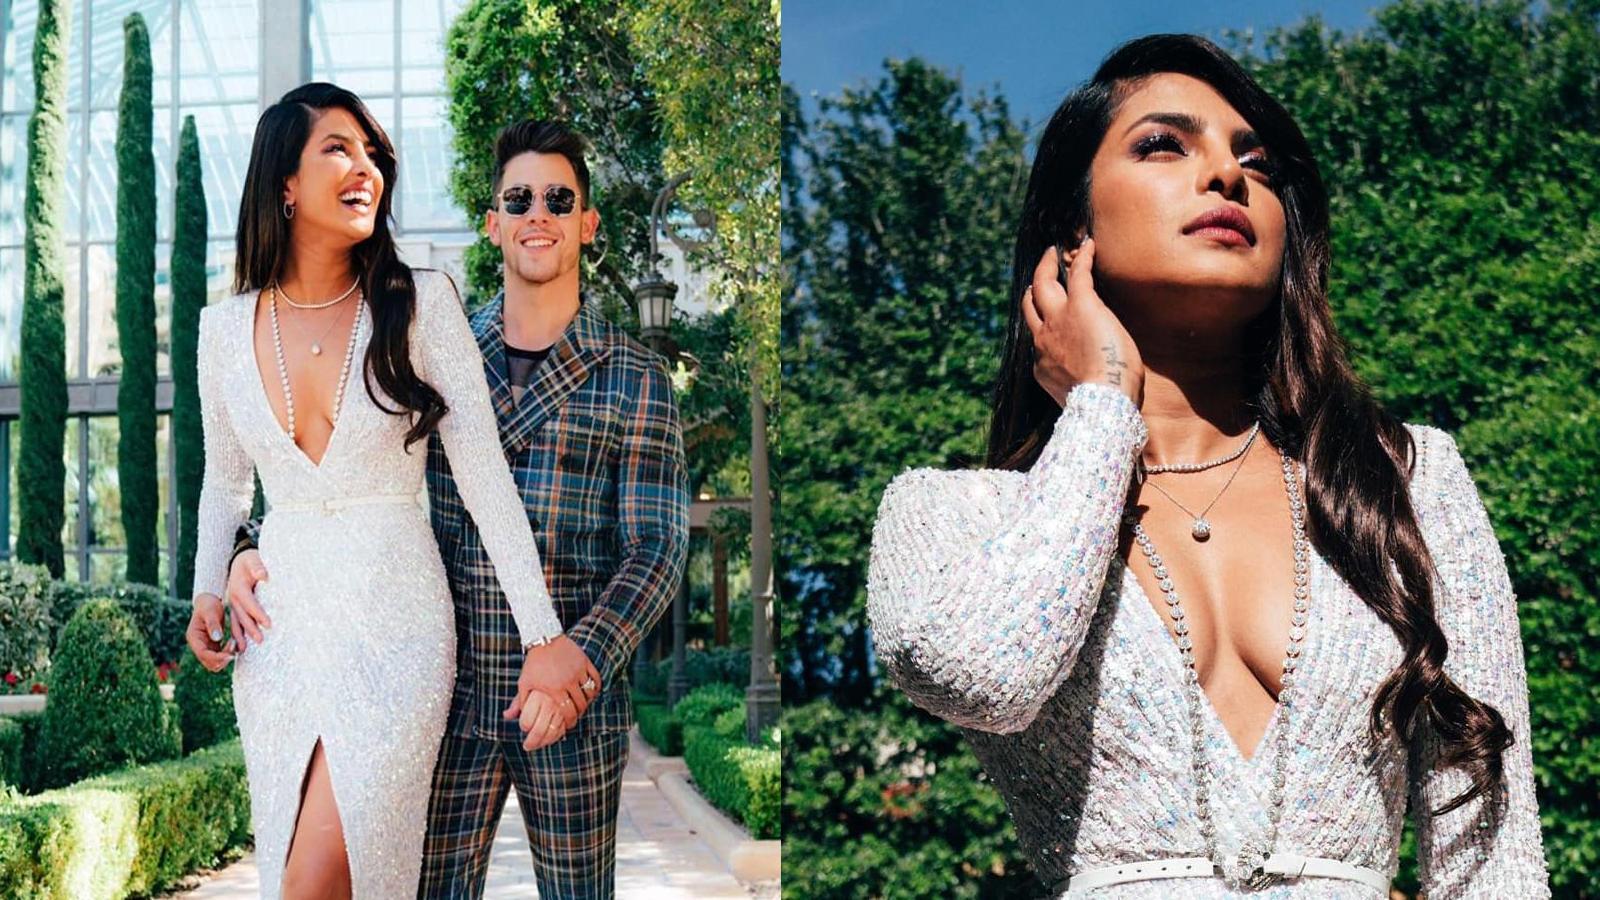 Priyanka Chopra cheers for hubby Nick Jonas as he performs at music awards